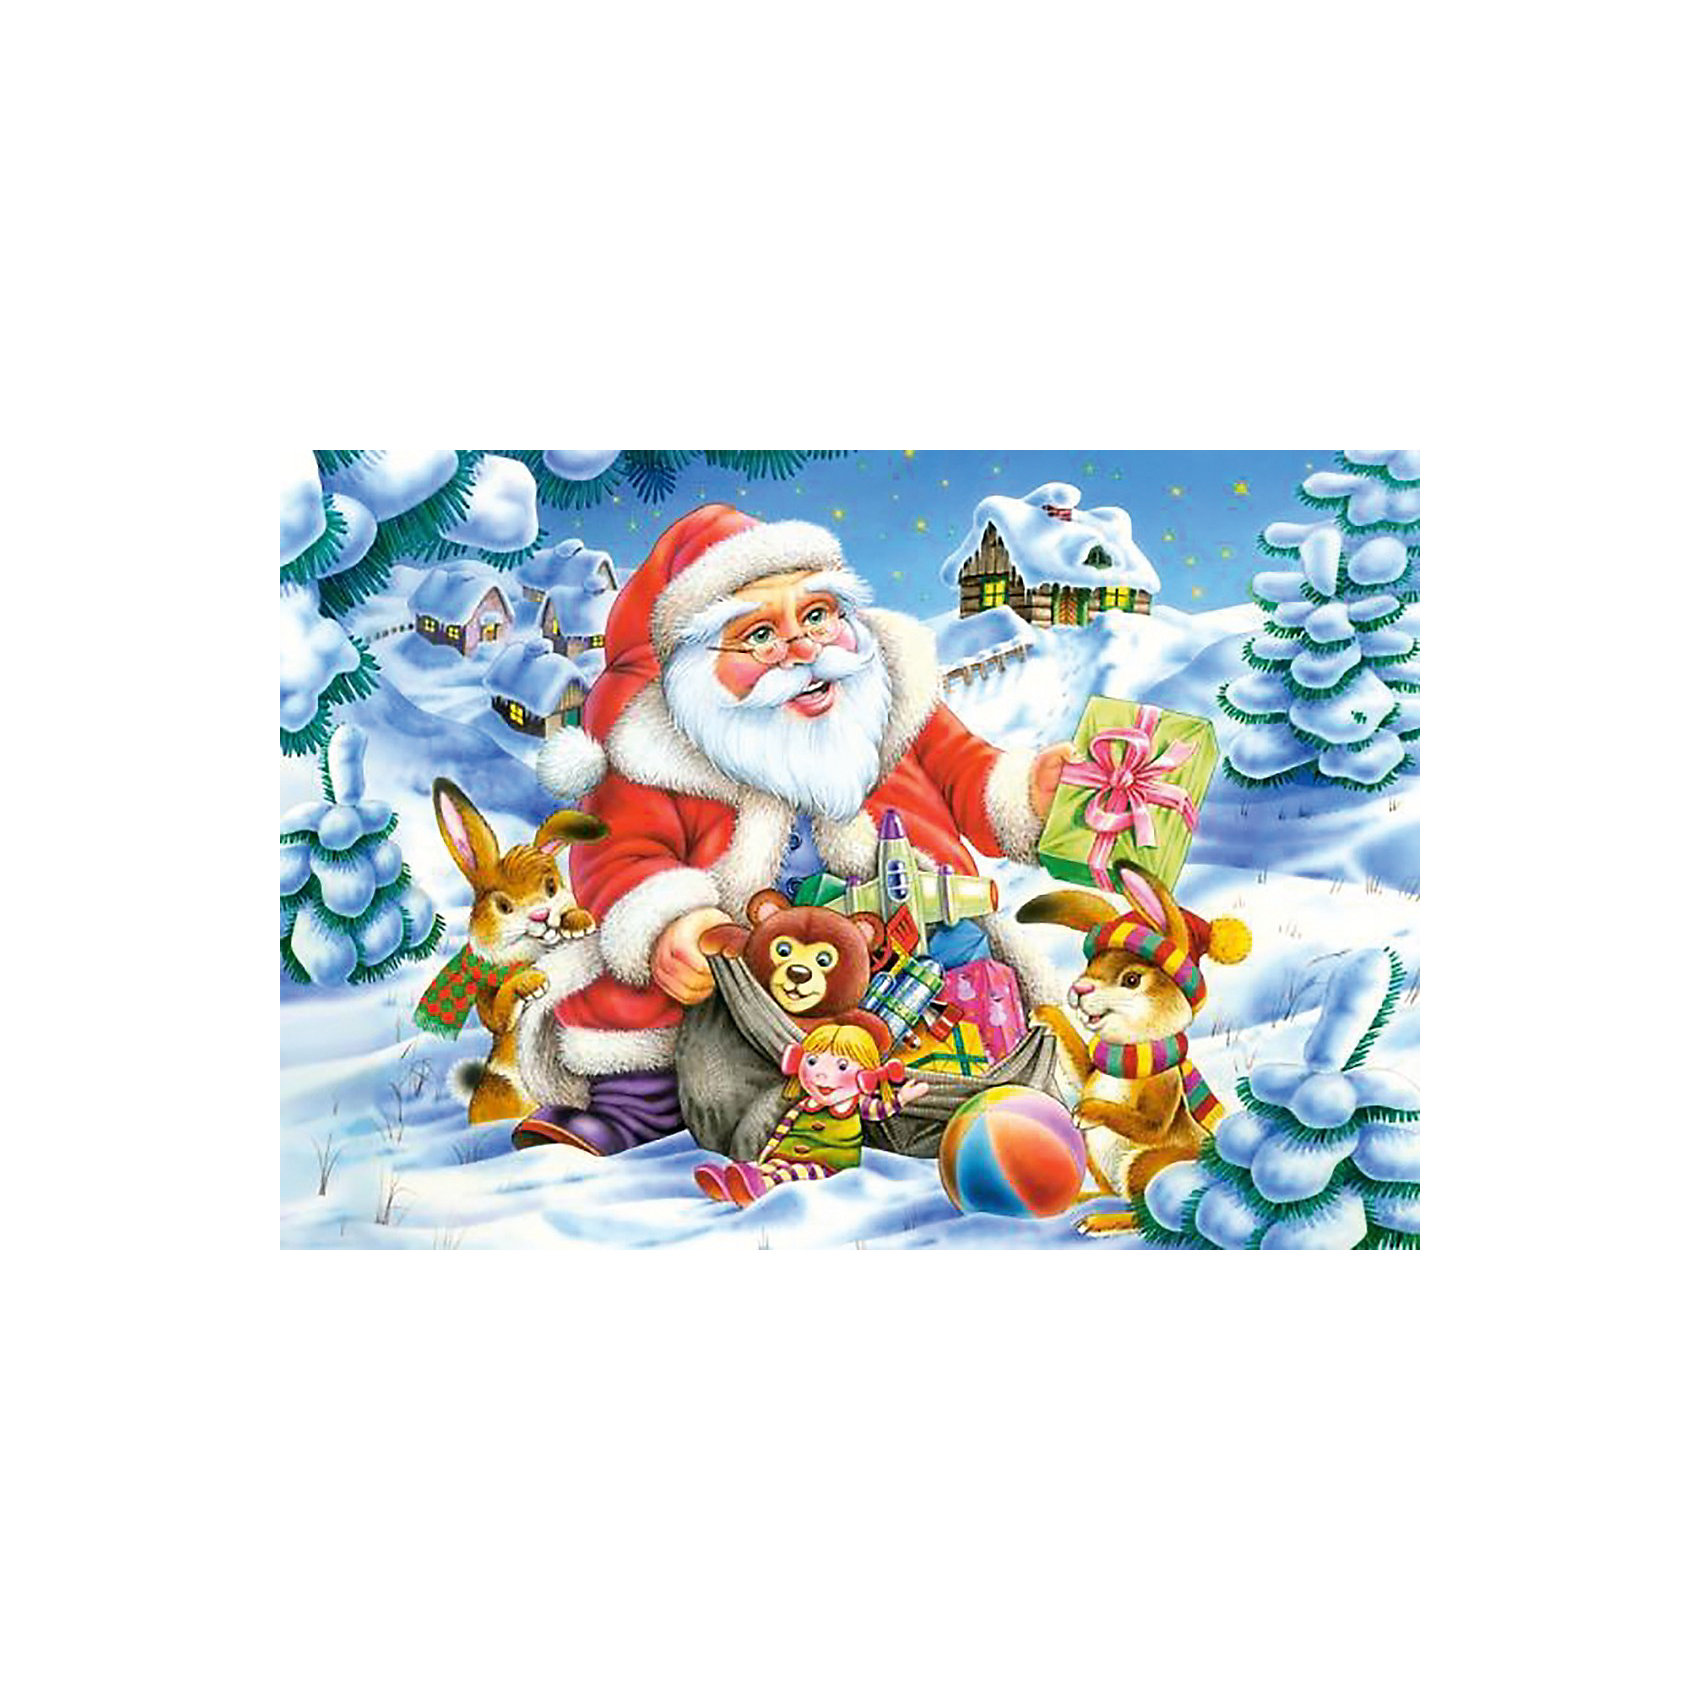 Castorland Пазл Санта Клаус, 500 деталей, Castorland castorland пазл красная шапочка castorland 20 деталей